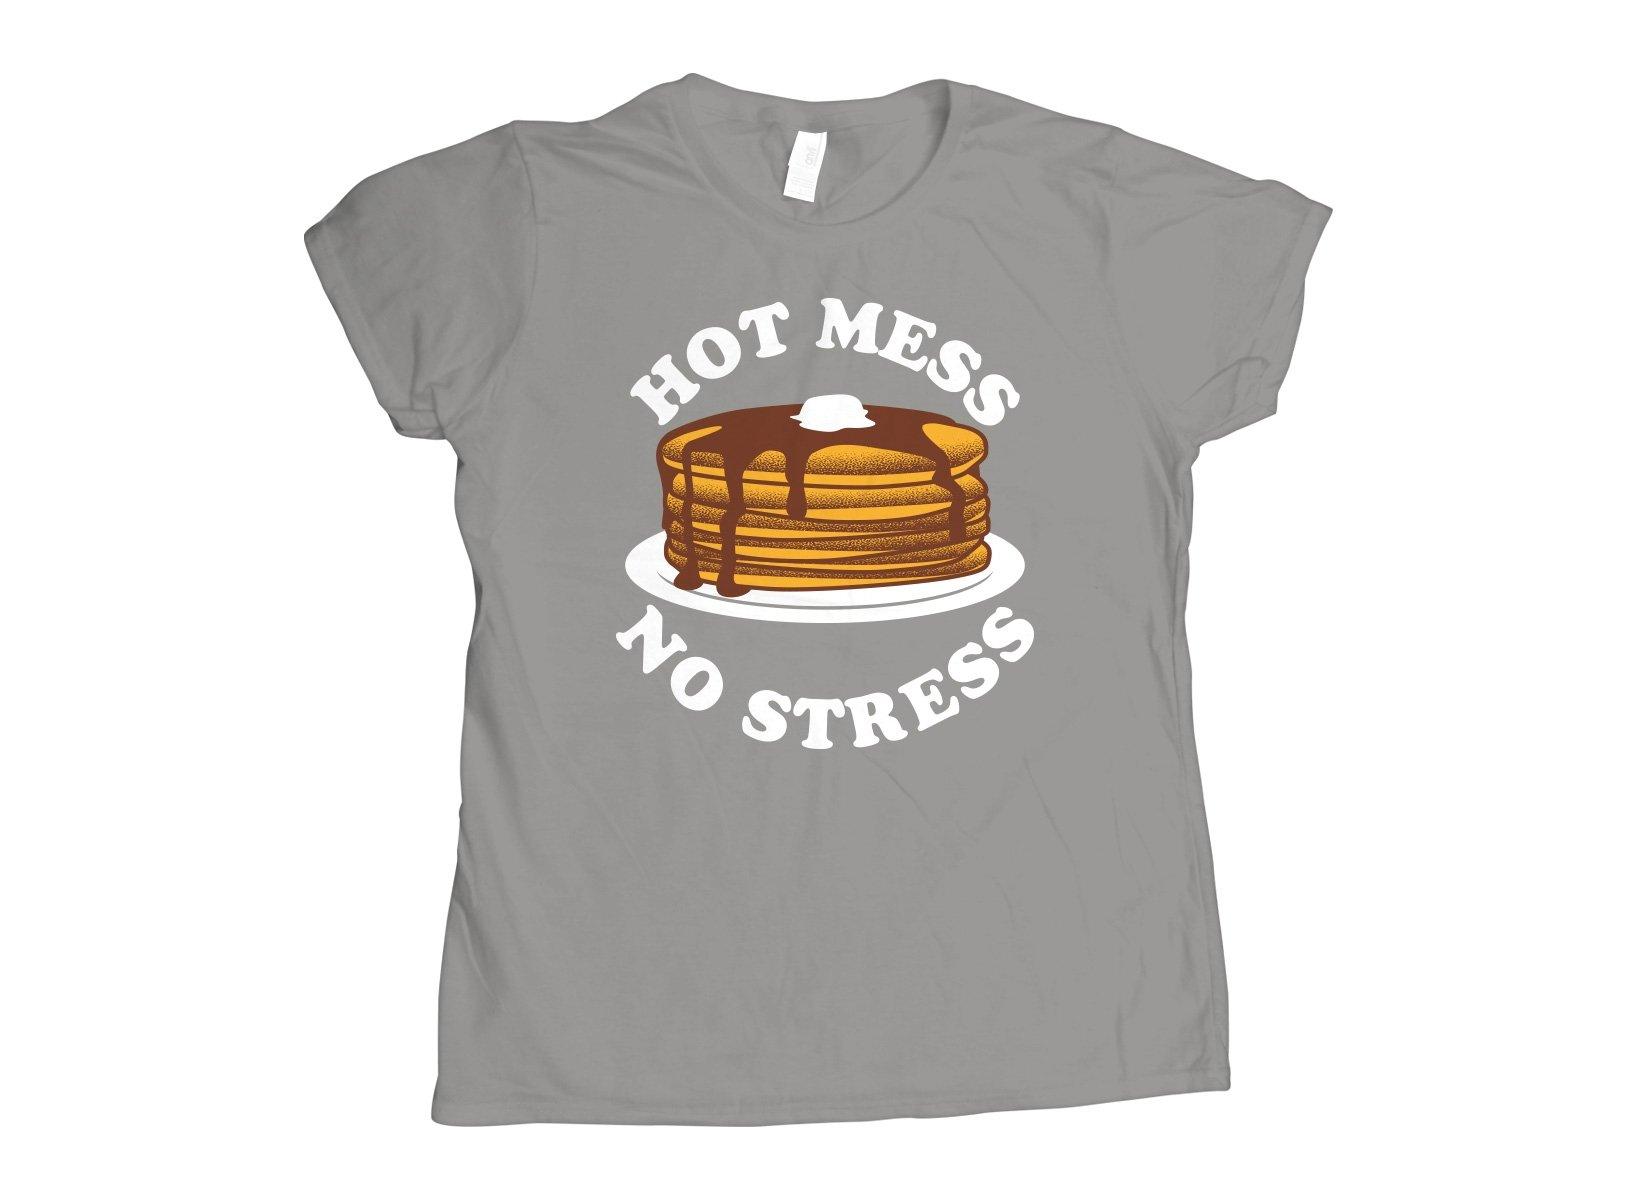 Hot Mess No Stress on Womens T-Shirt